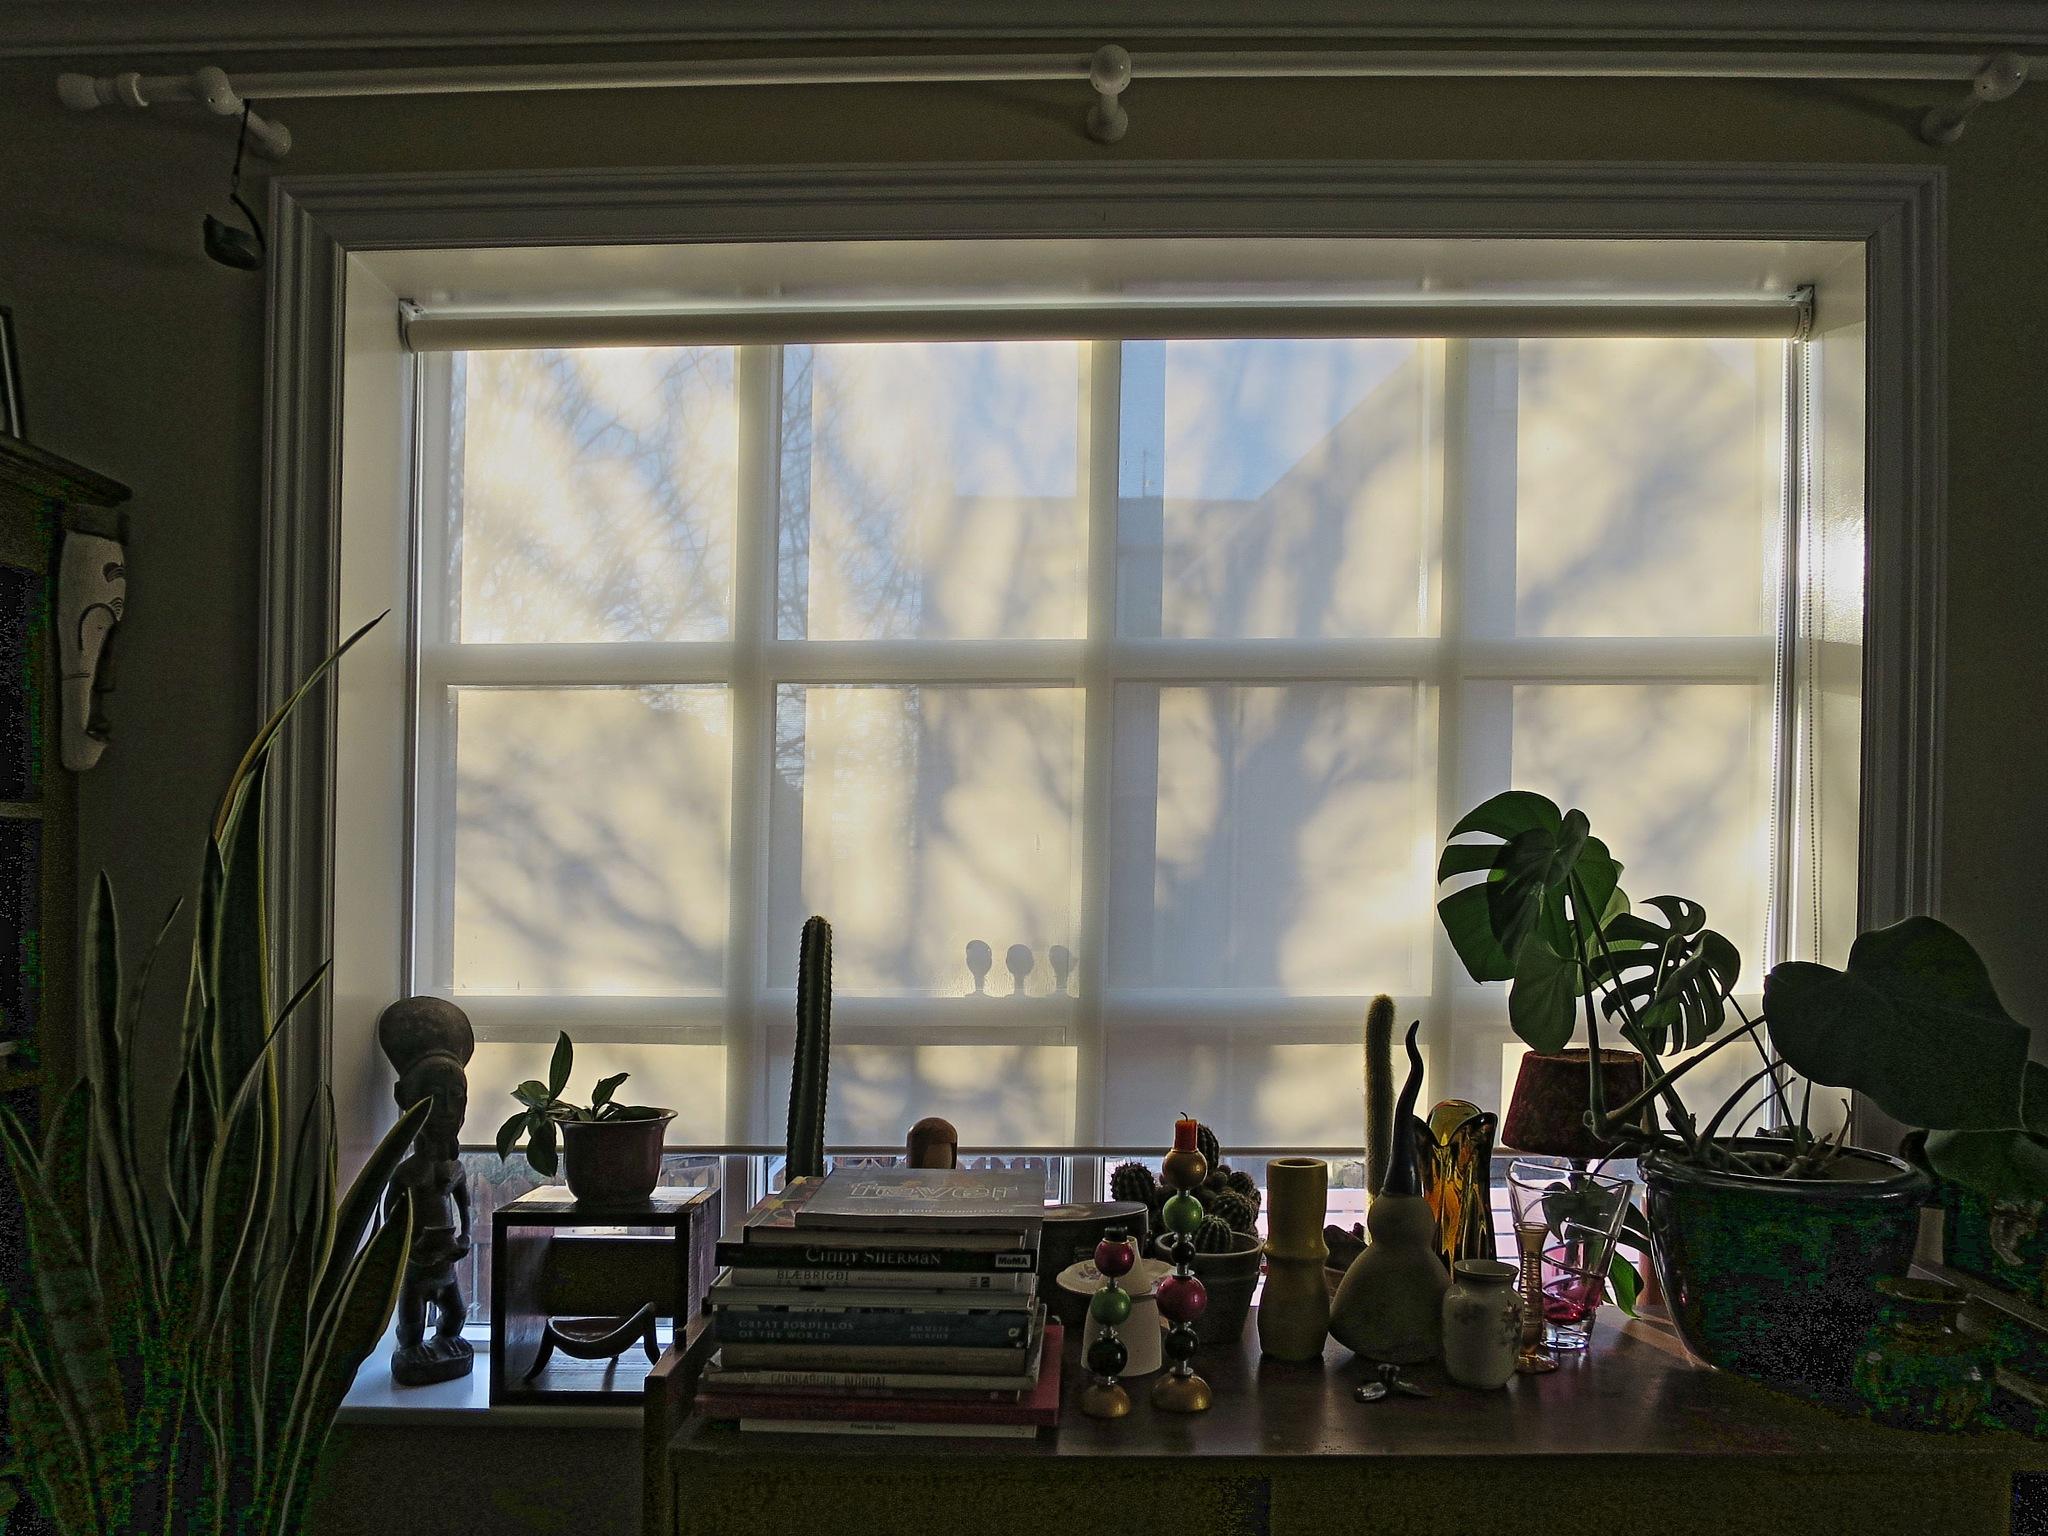 Interior. by Dadi Gudbjornsson